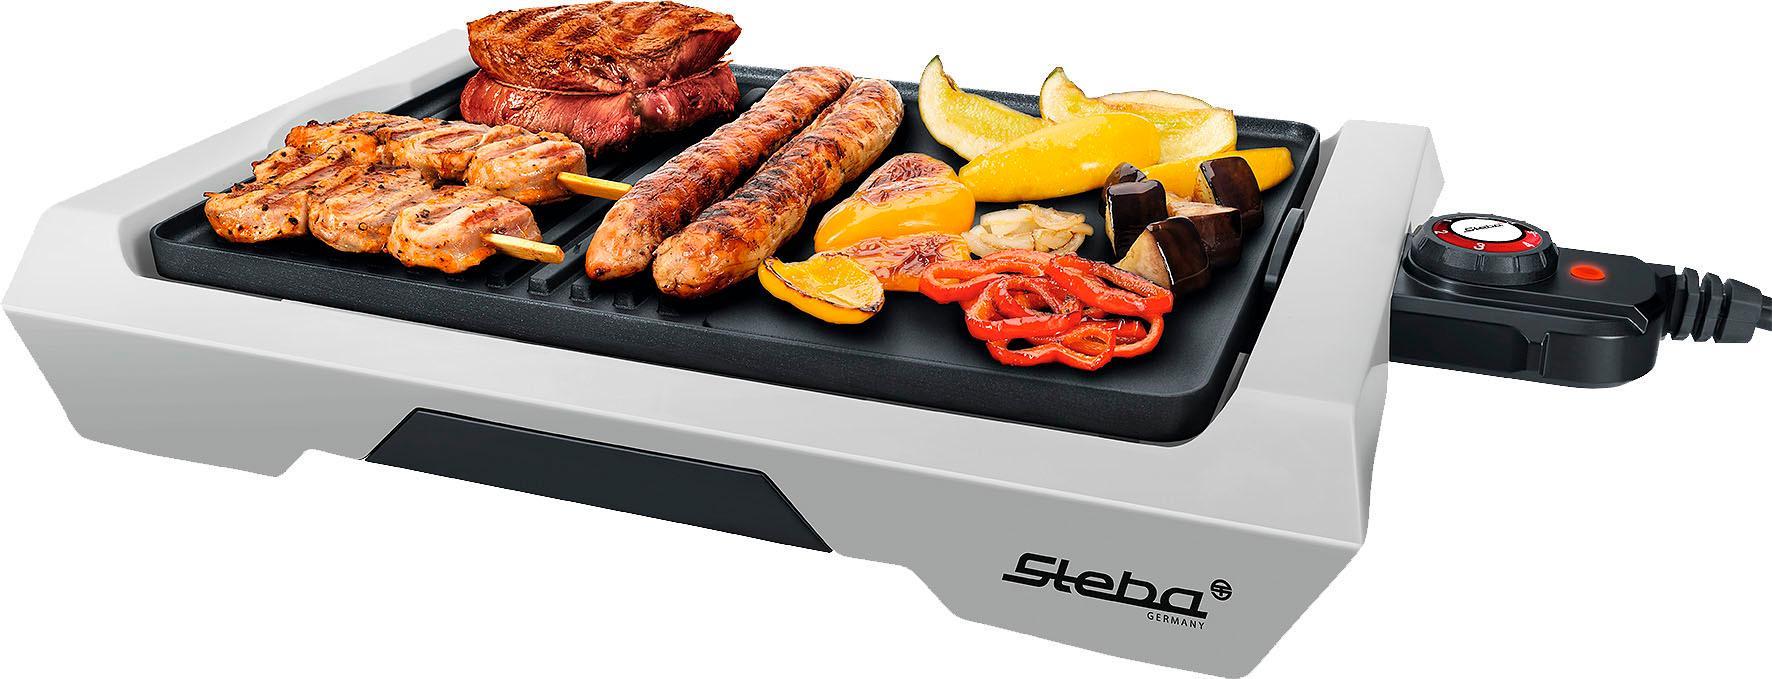 Steba Tischgrill VG 50 grau Grill SOFORT LIEFERBARE Haushaltsgeräte